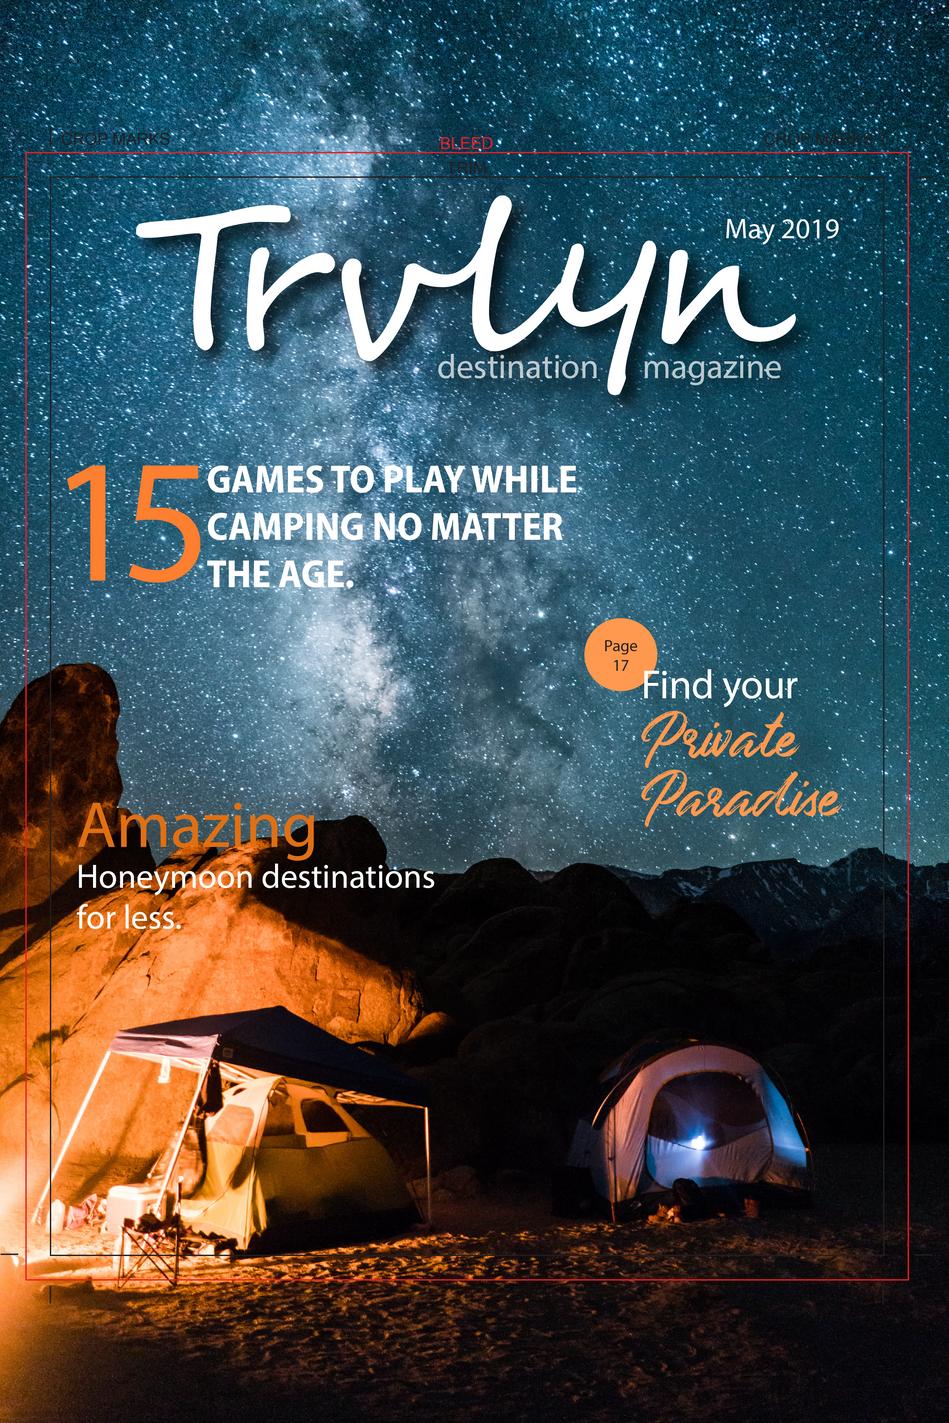 Trvlyn magazine/logo design